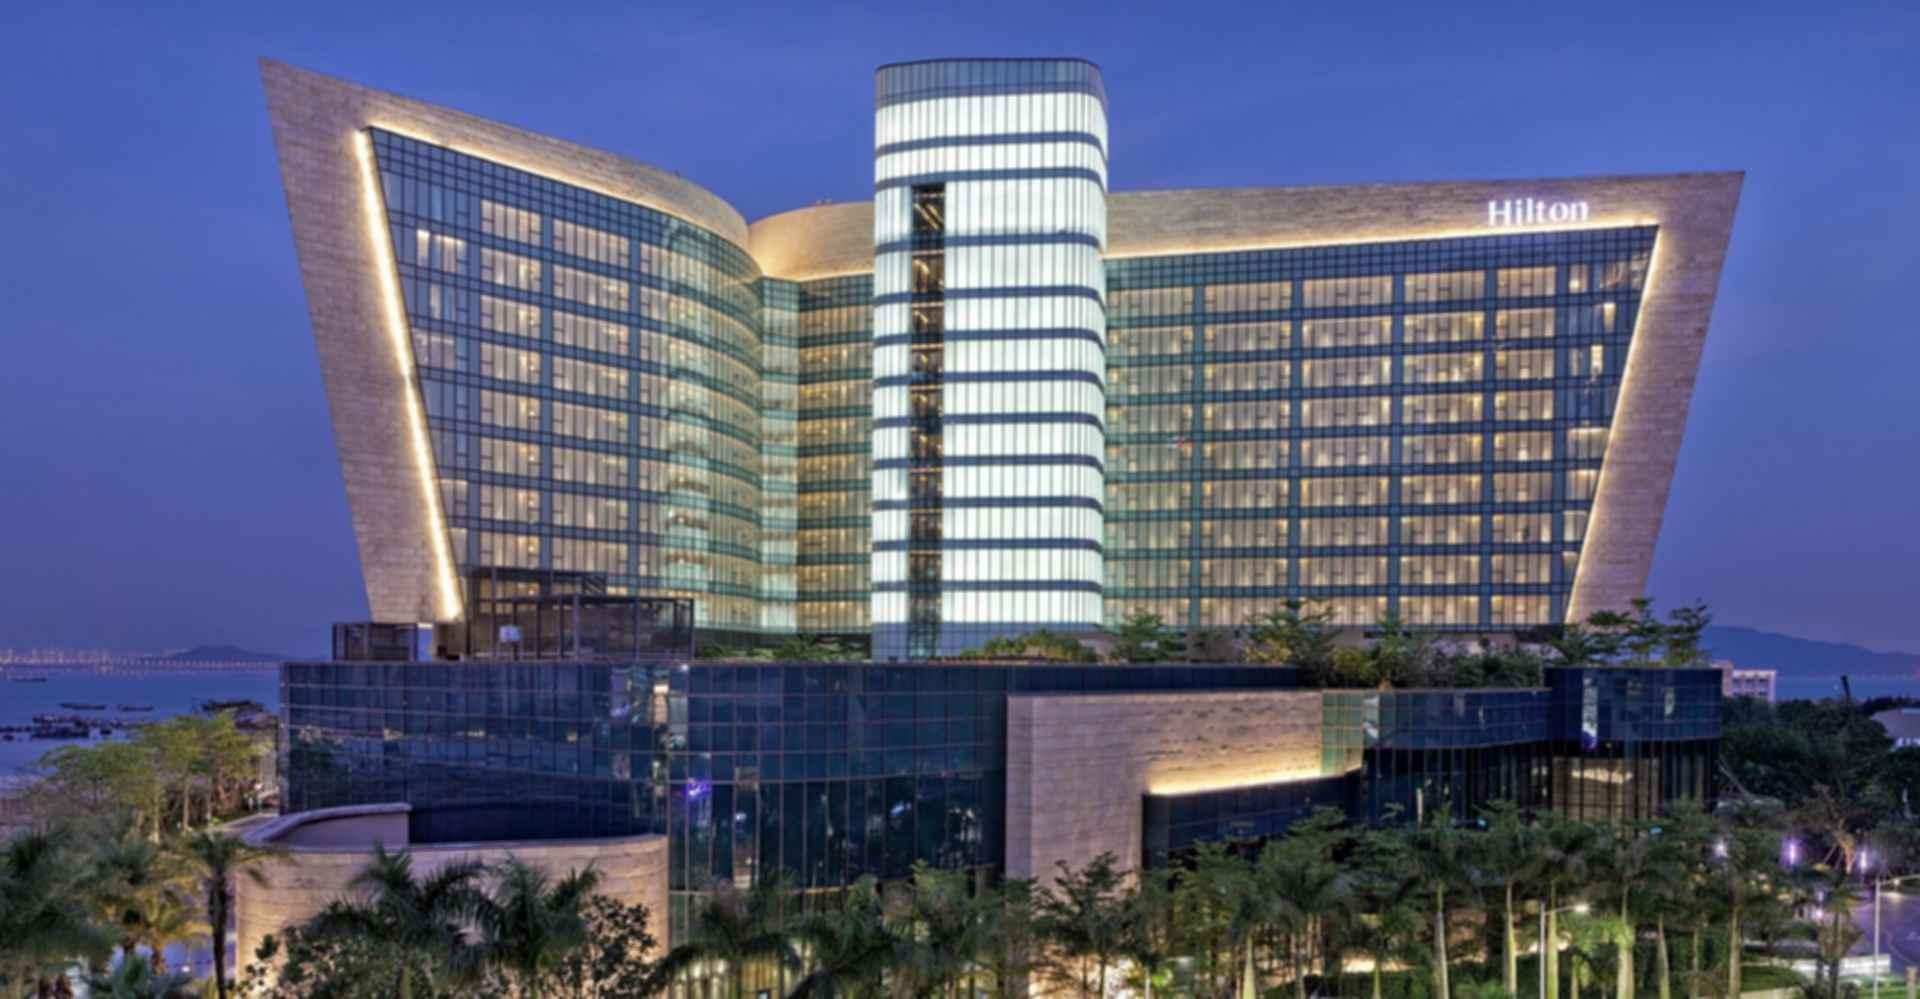 Hilton Shenzhen Marina Hotel